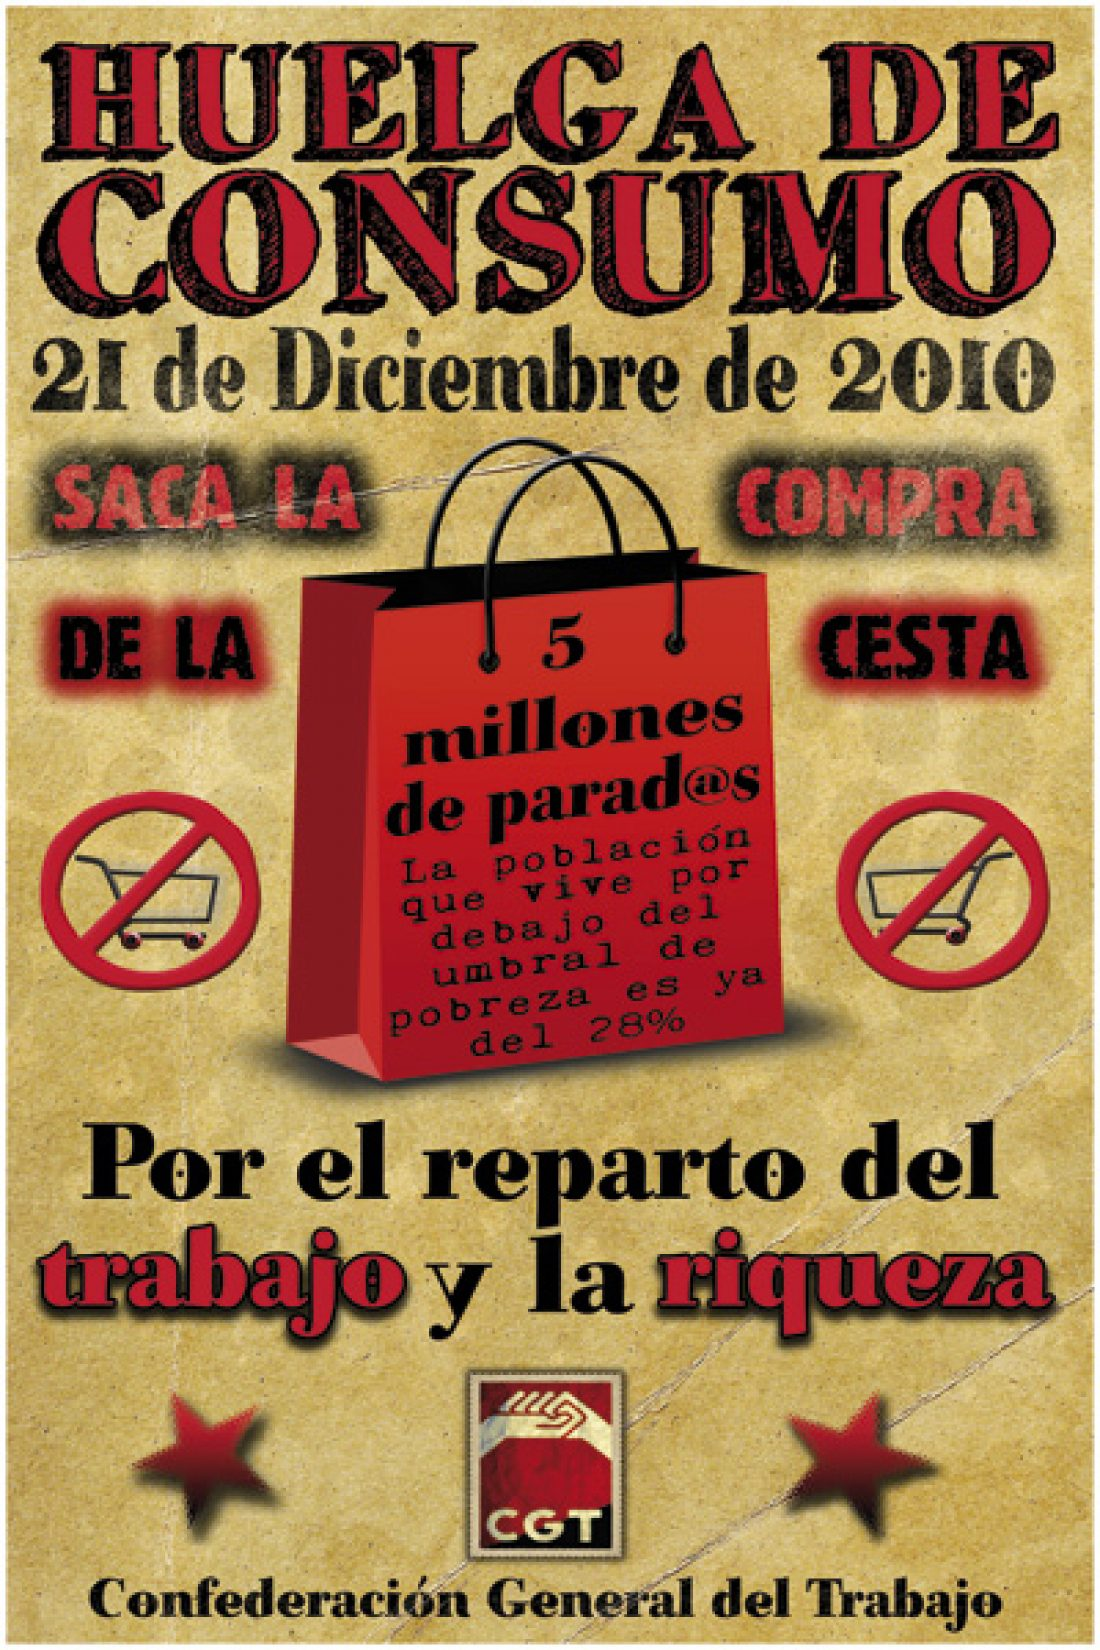 Hoy 21 de Diciembre, Huelga Estatal de Consumo